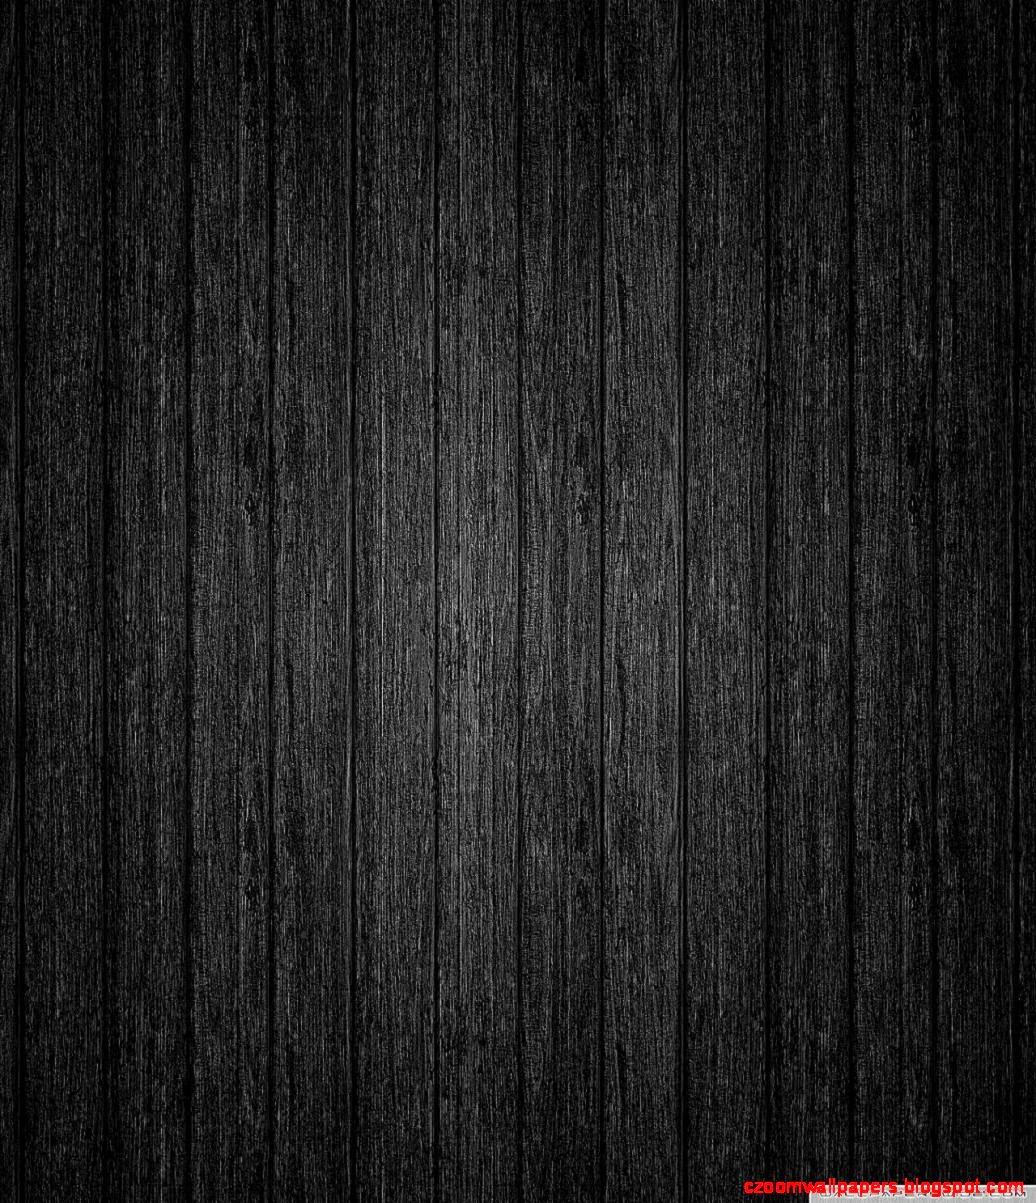 Dark Wood Wallpaper Android | Zoom Wallpapers